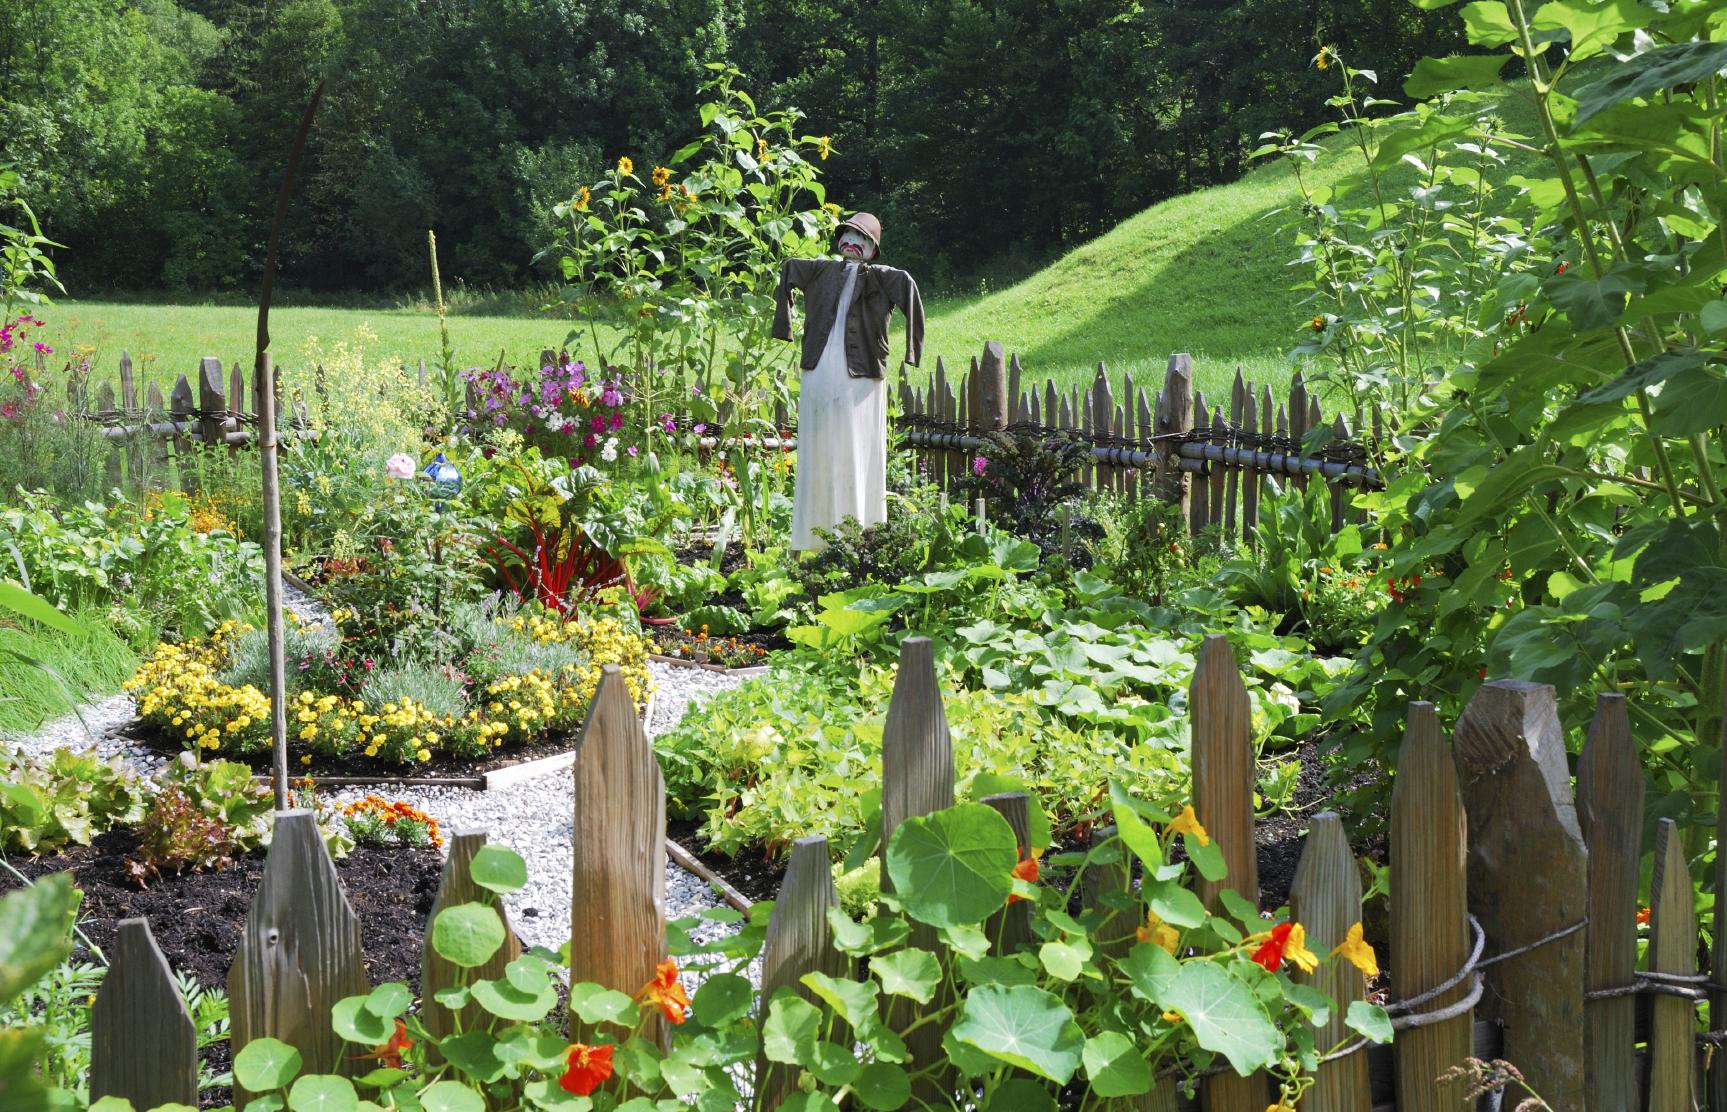 Free Photo Vegetable Garden Garden Grow Growing Free